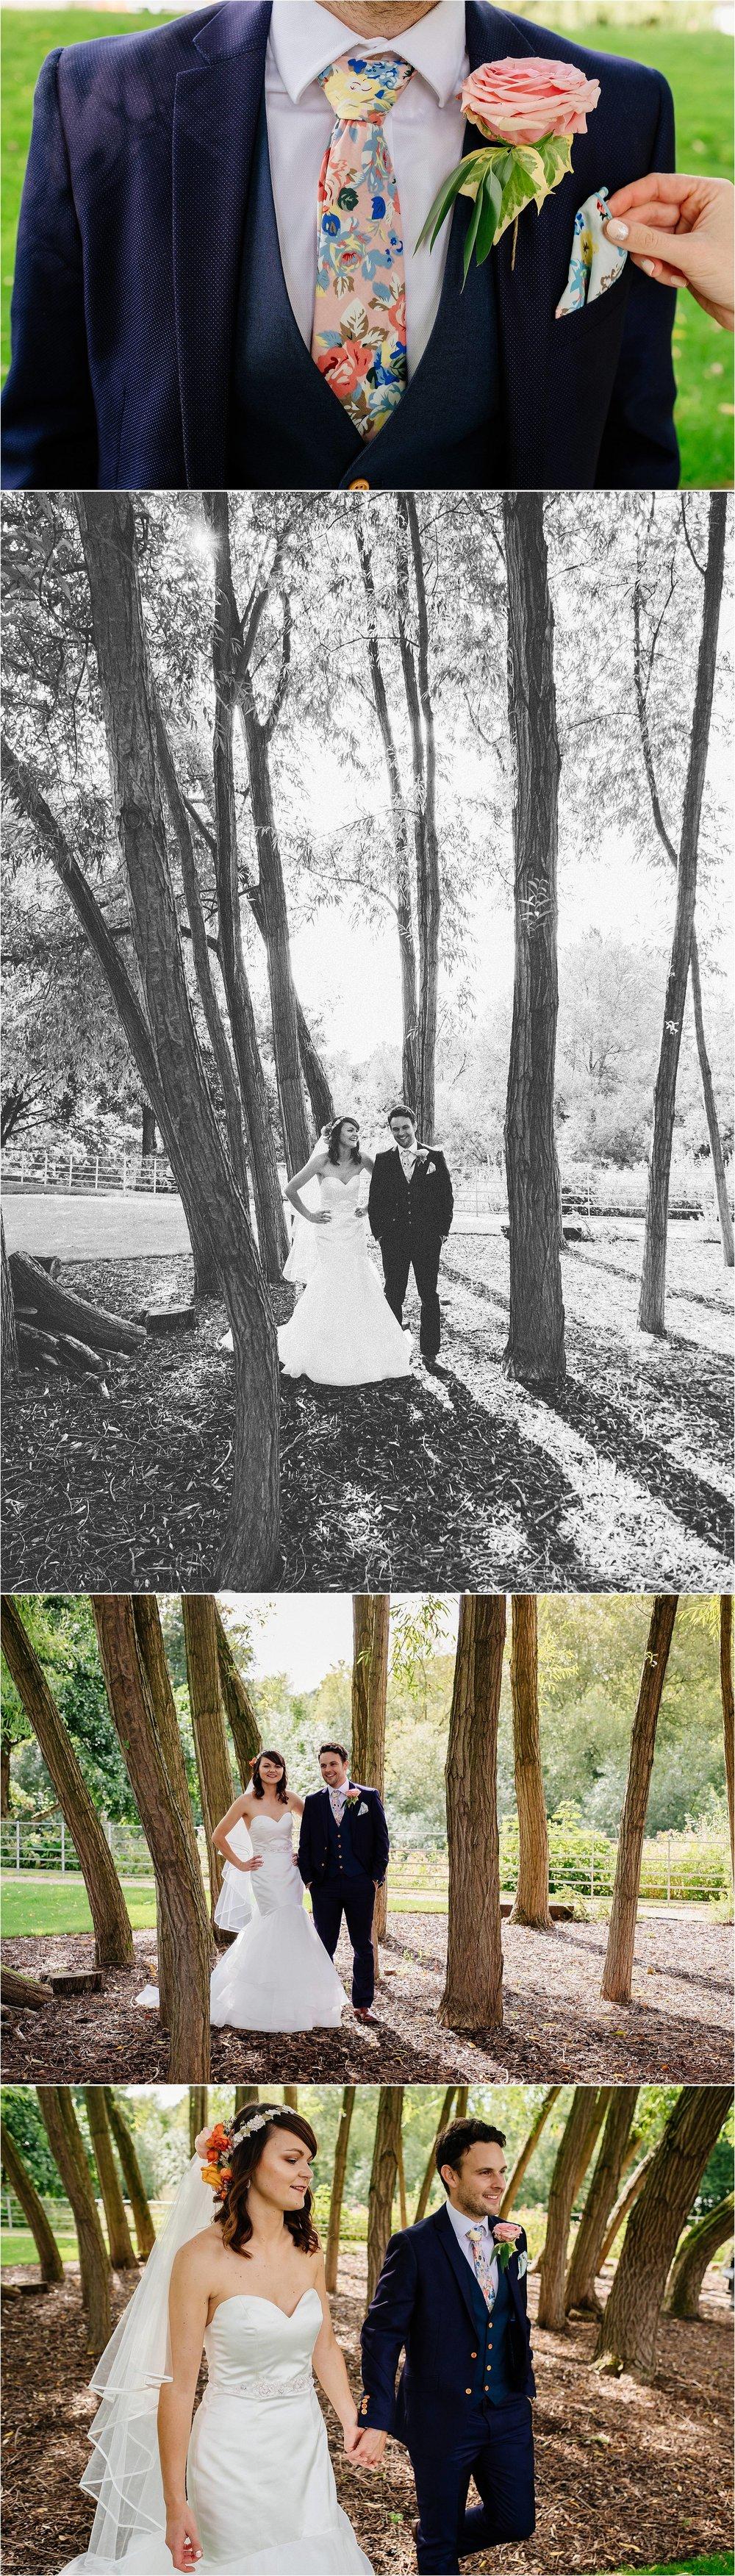 West Mill Wedding Photography_0061.jpg